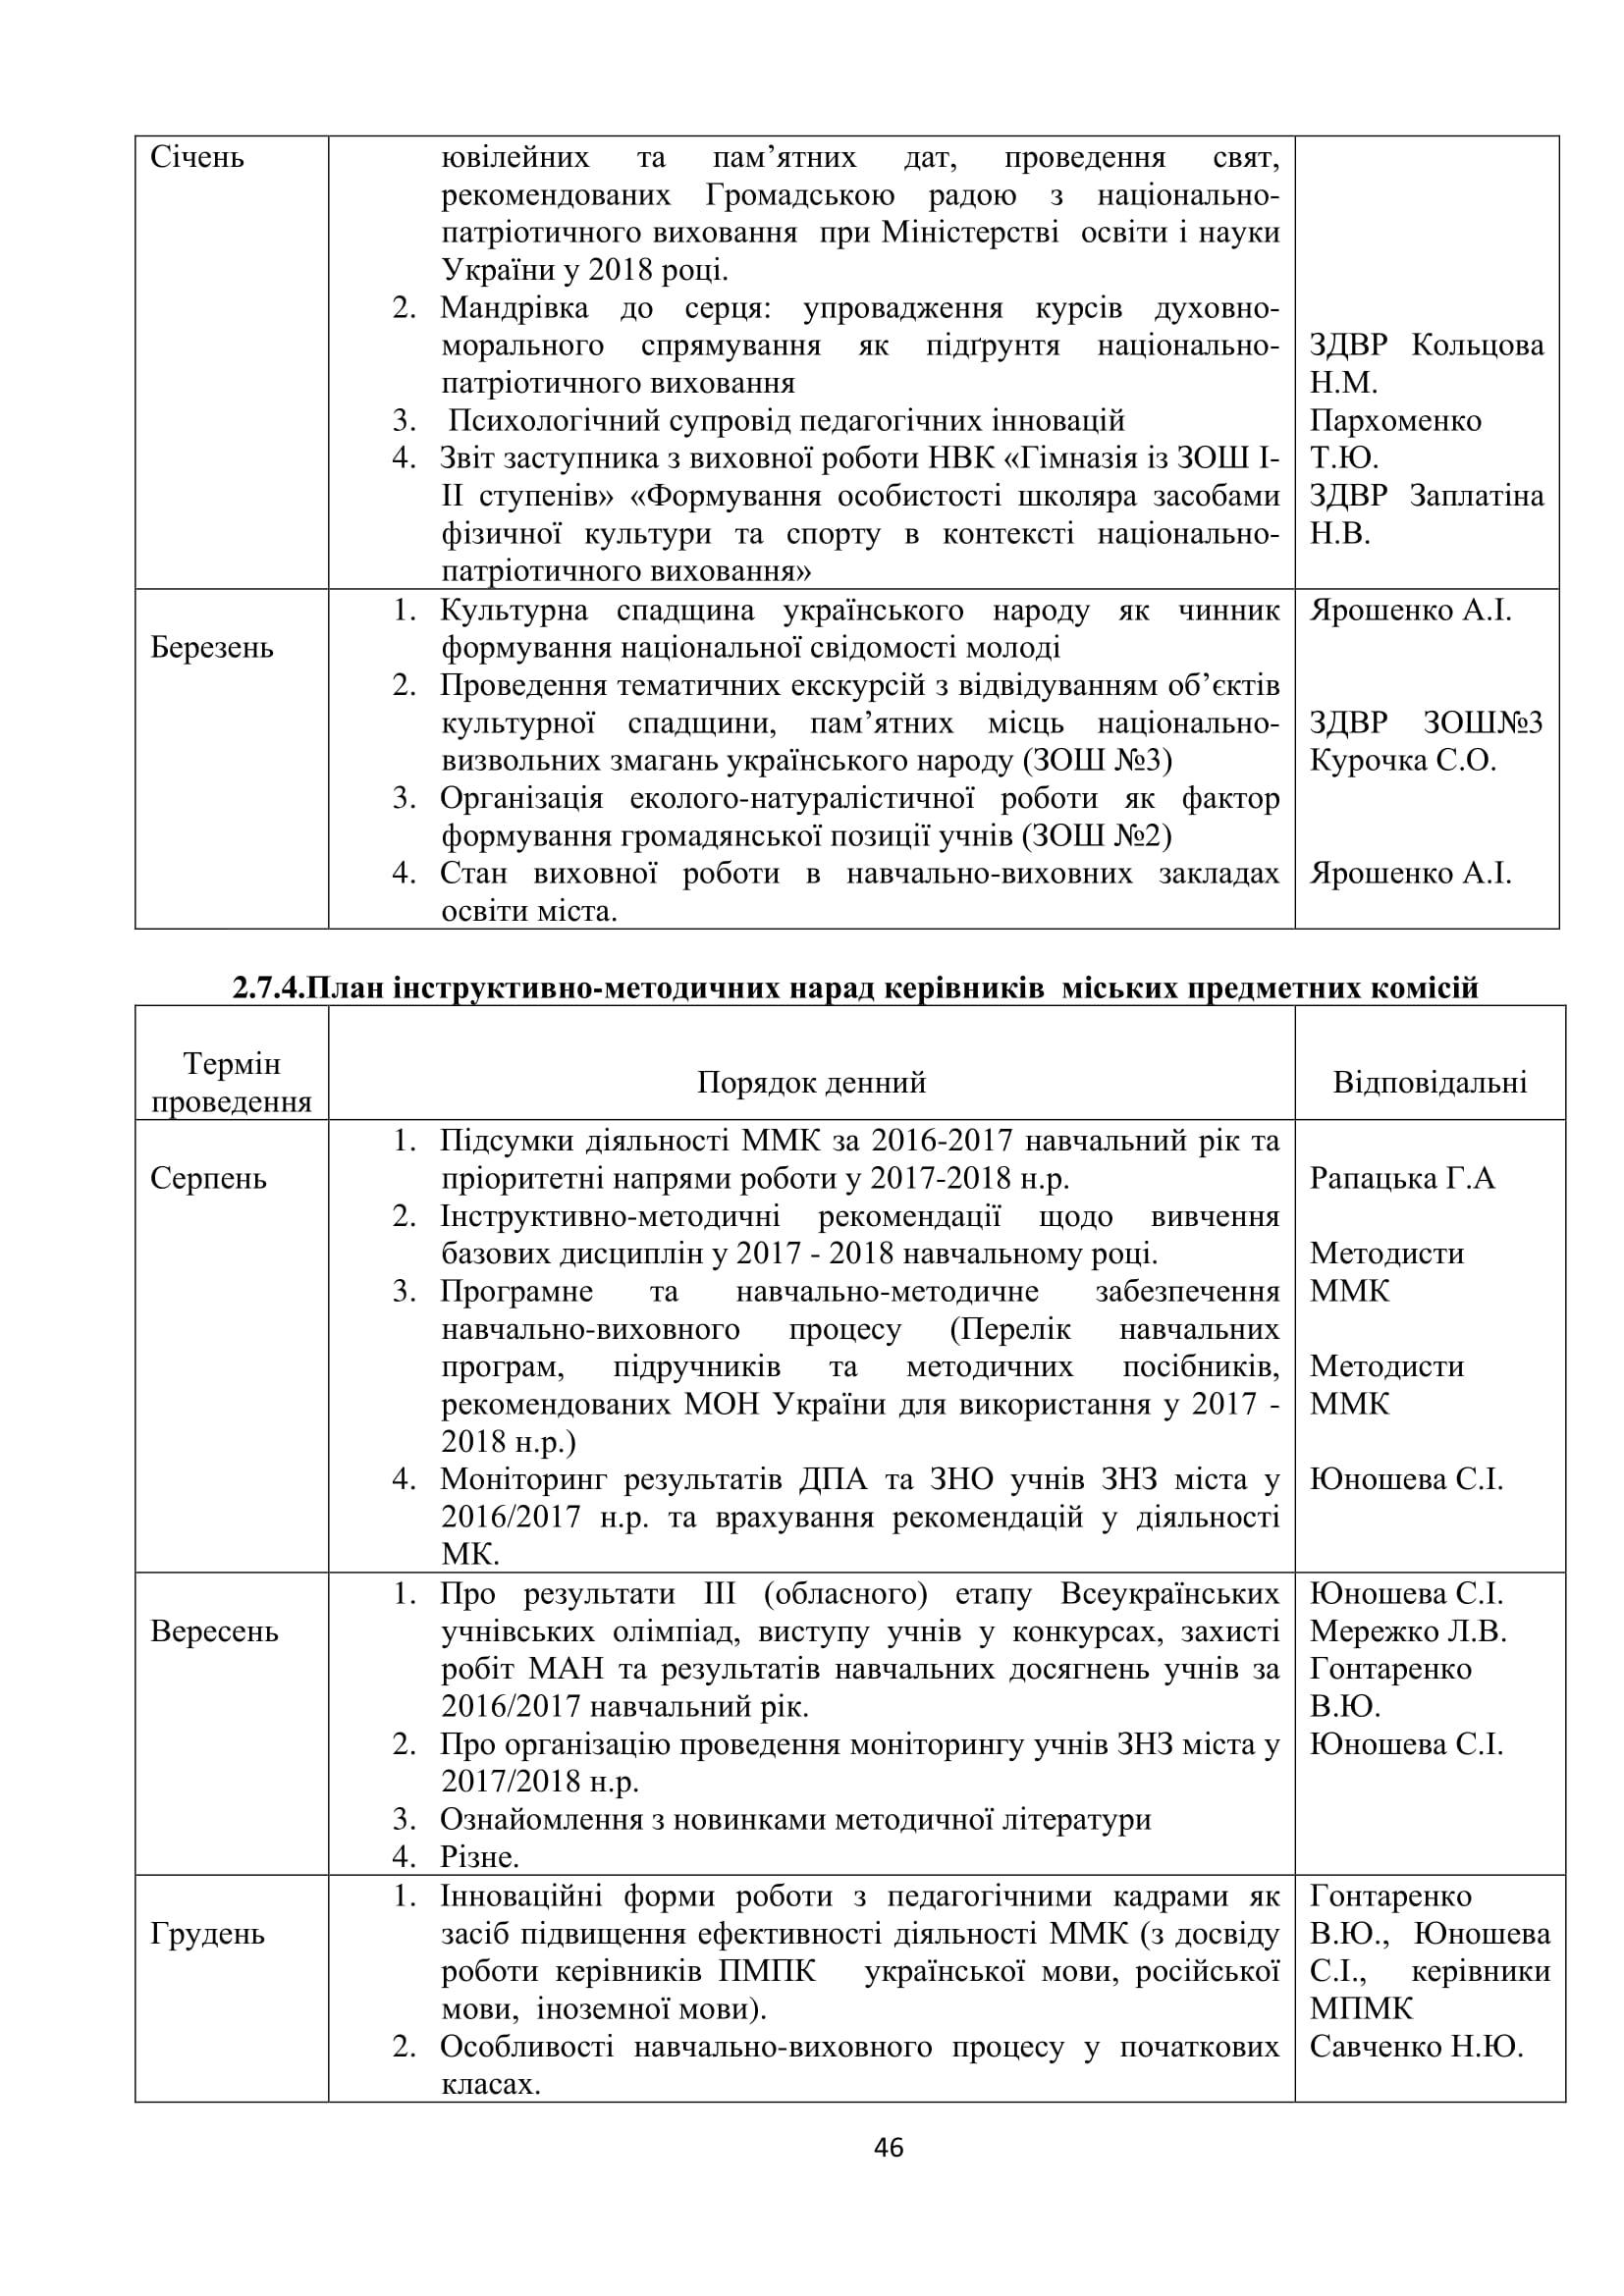 2017-2018 - ММК план роботи-47